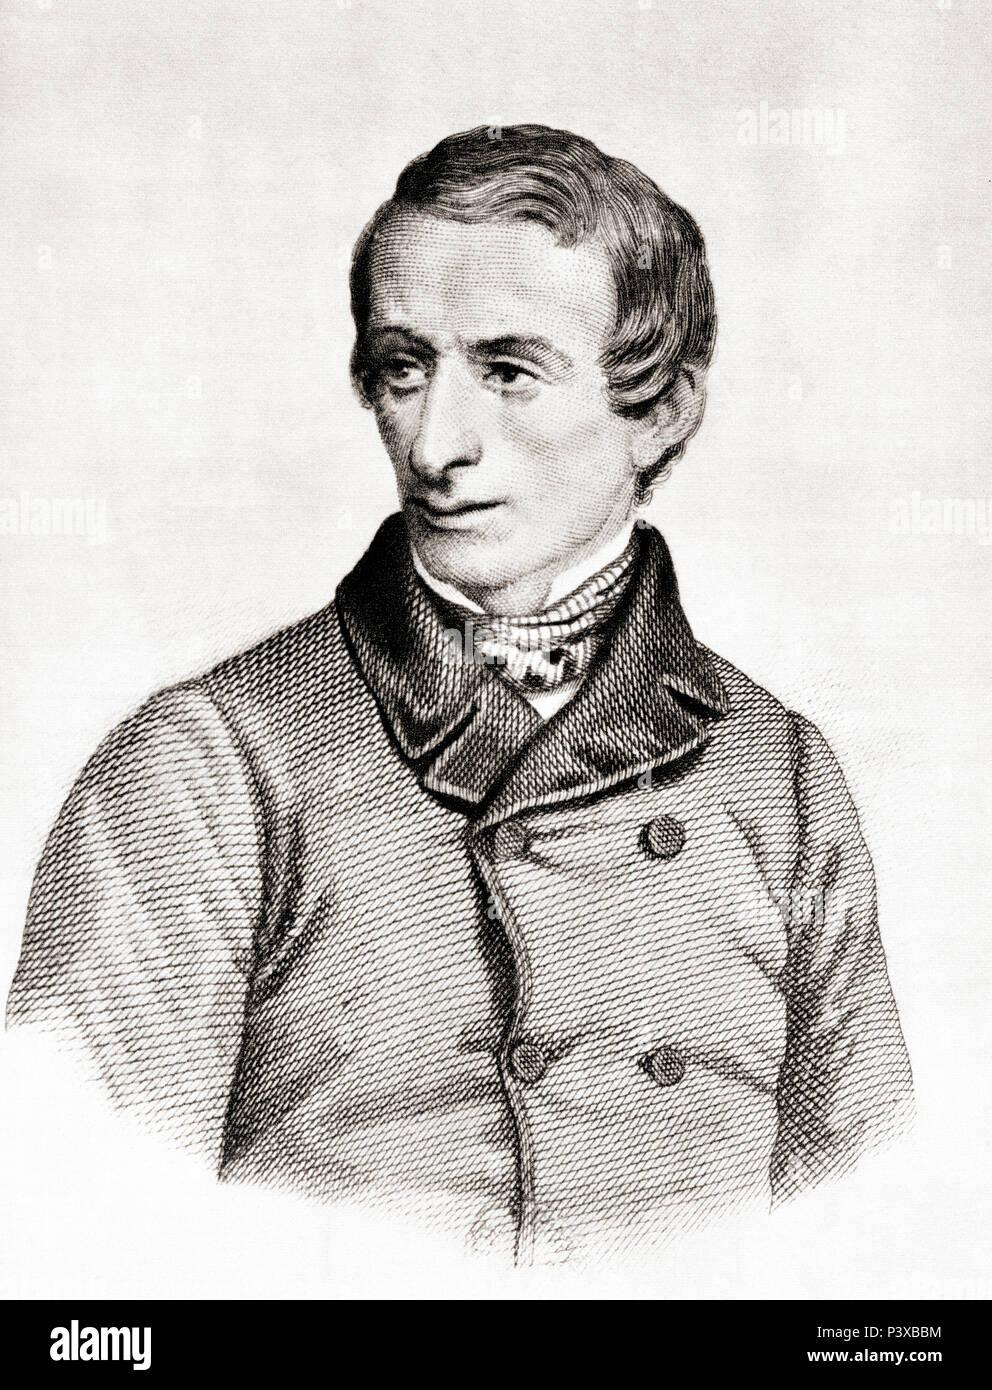 Giacomo Taldegardo Francesco di Sales Saverio Pietro Leopardi, 1798 – 1837.  Italian philosopher, poet, essayist and philologist. After a contemporary print. - Stock Image